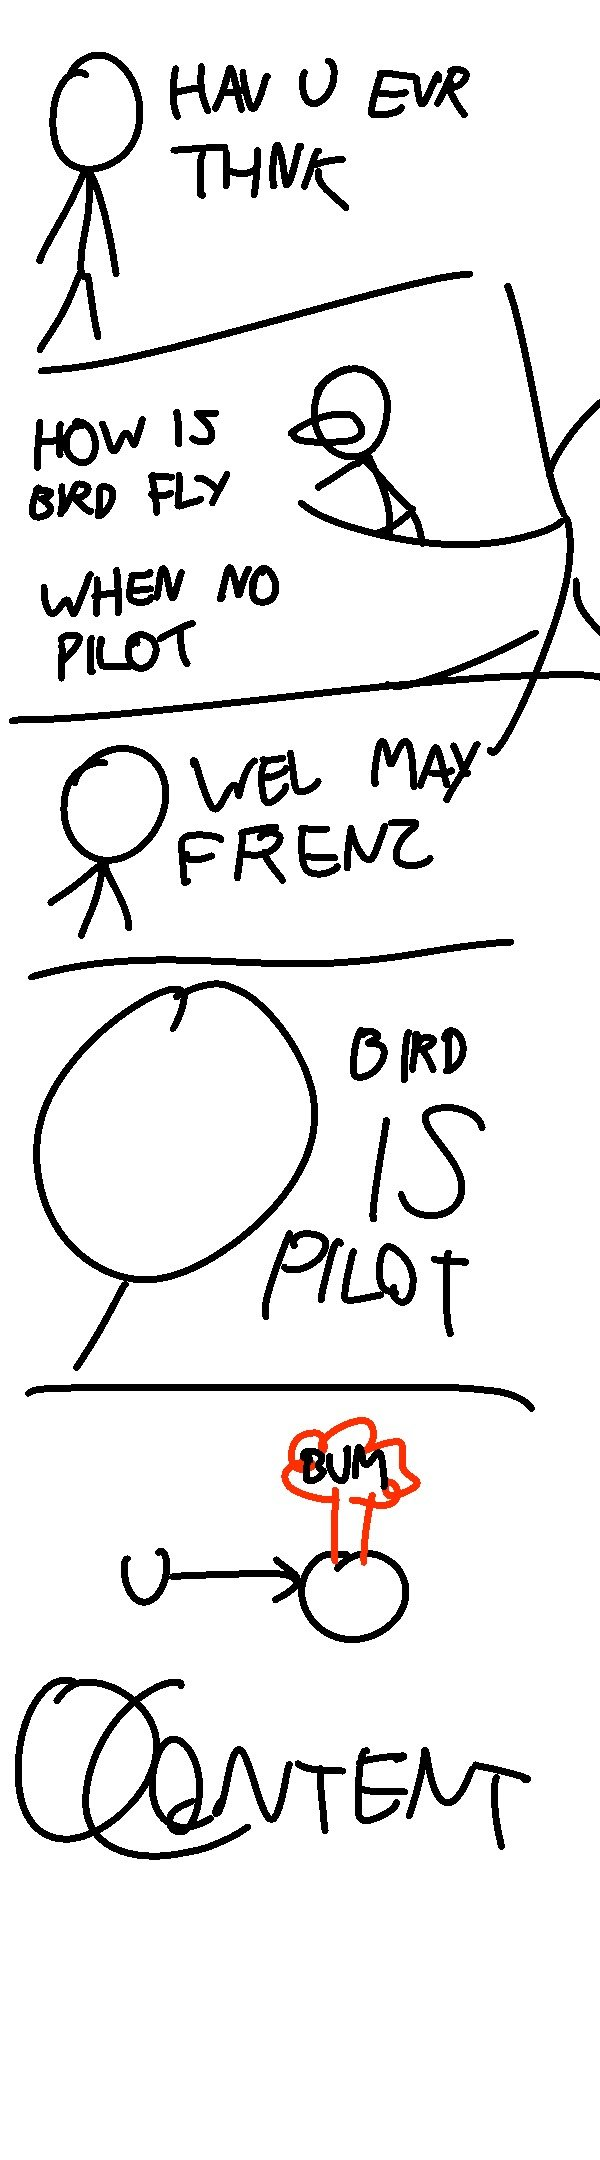 brid. pls subscrib favo enn lik four more supre cmics.. a pilot you say?